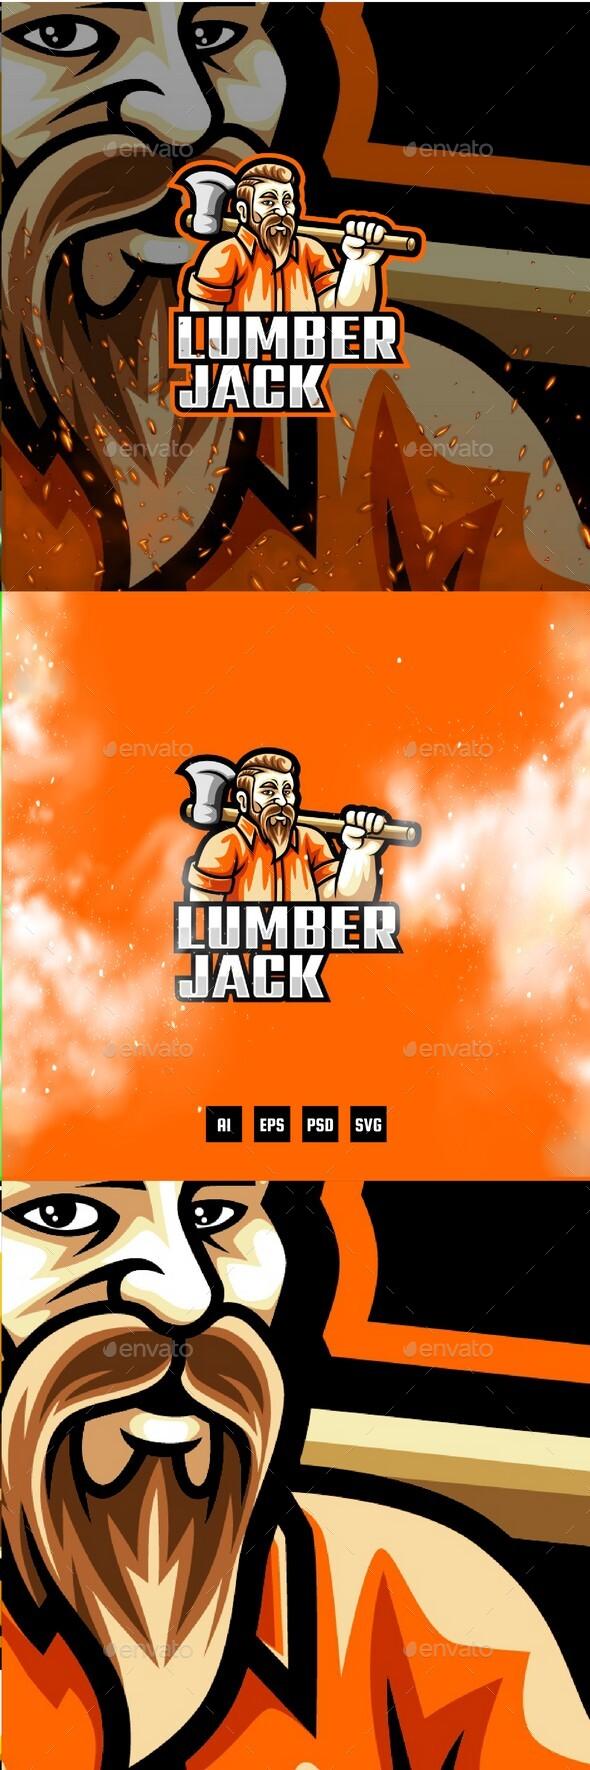 Lumberjack E-Sport and Sport Logo Template